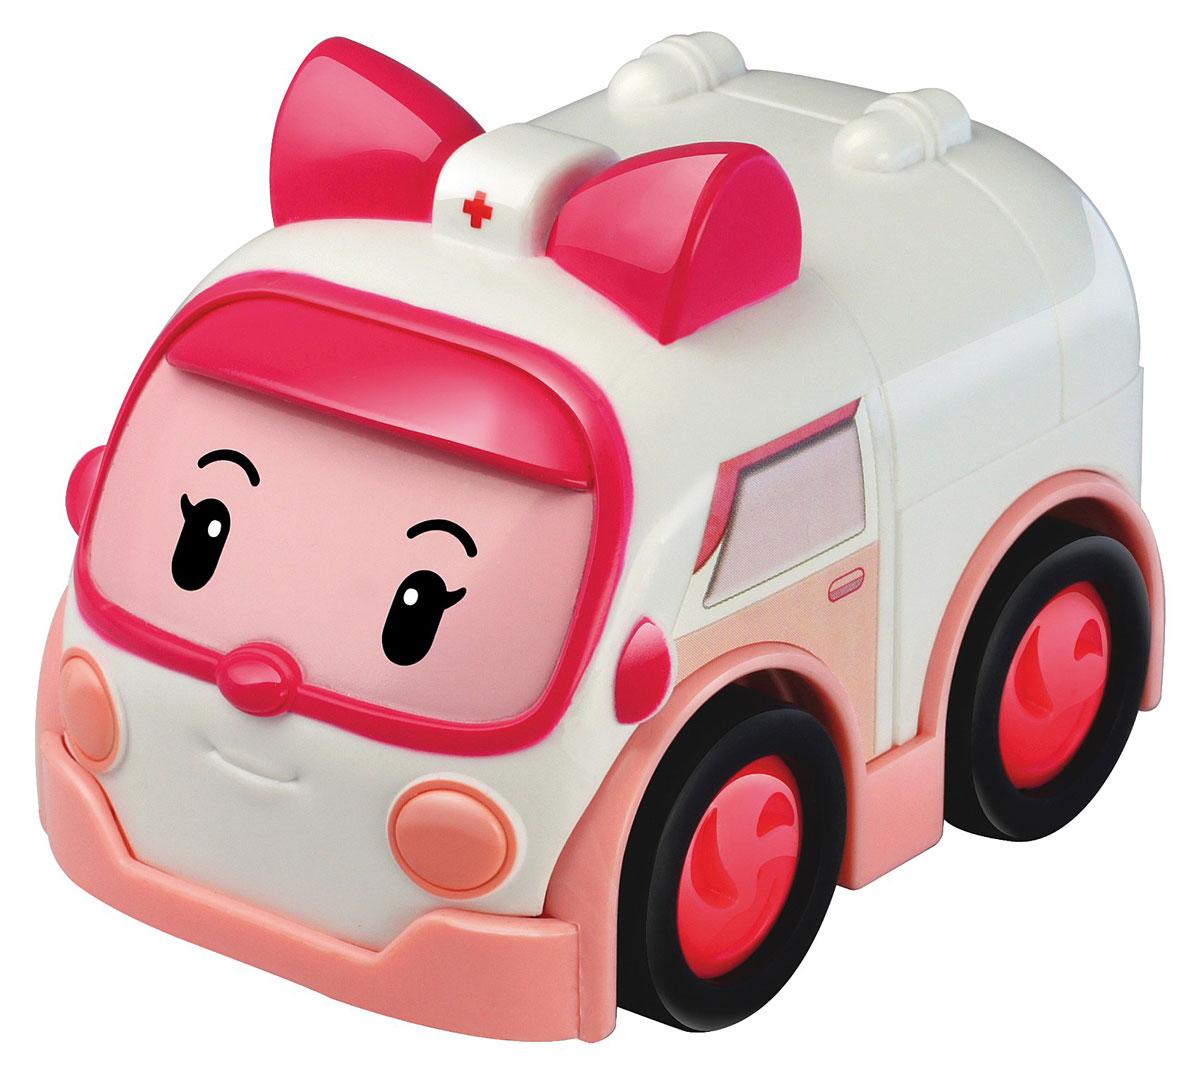 Robocar Poli Игрушка-трансформер Эмбер 7 см игрушка